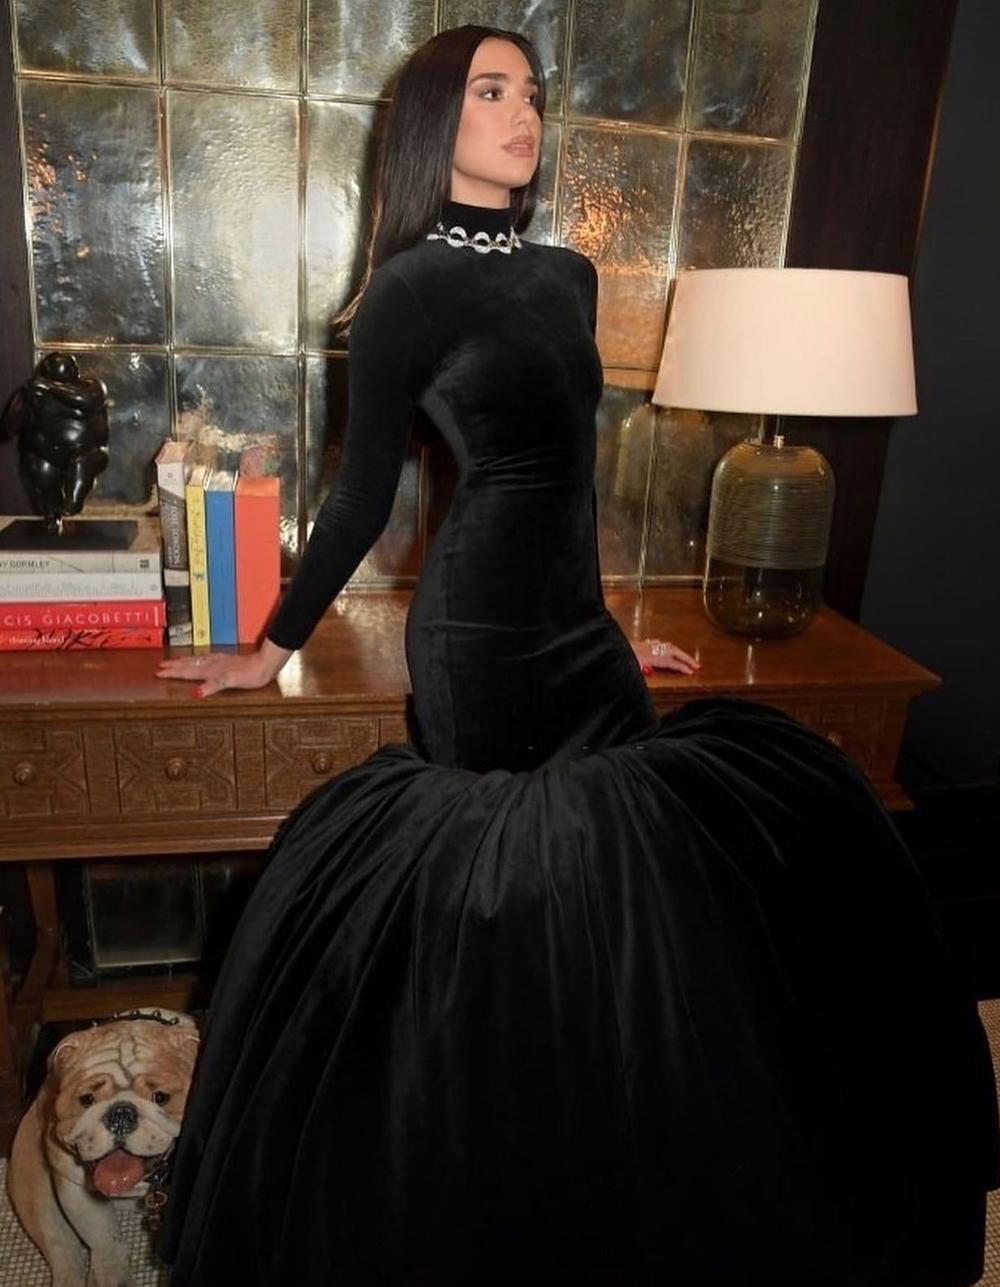 2021 Oscars Fashion I Dua Lipa wears custom Balenciaga for Elton John AIDS Foundation performance #fashionstyle #stylish